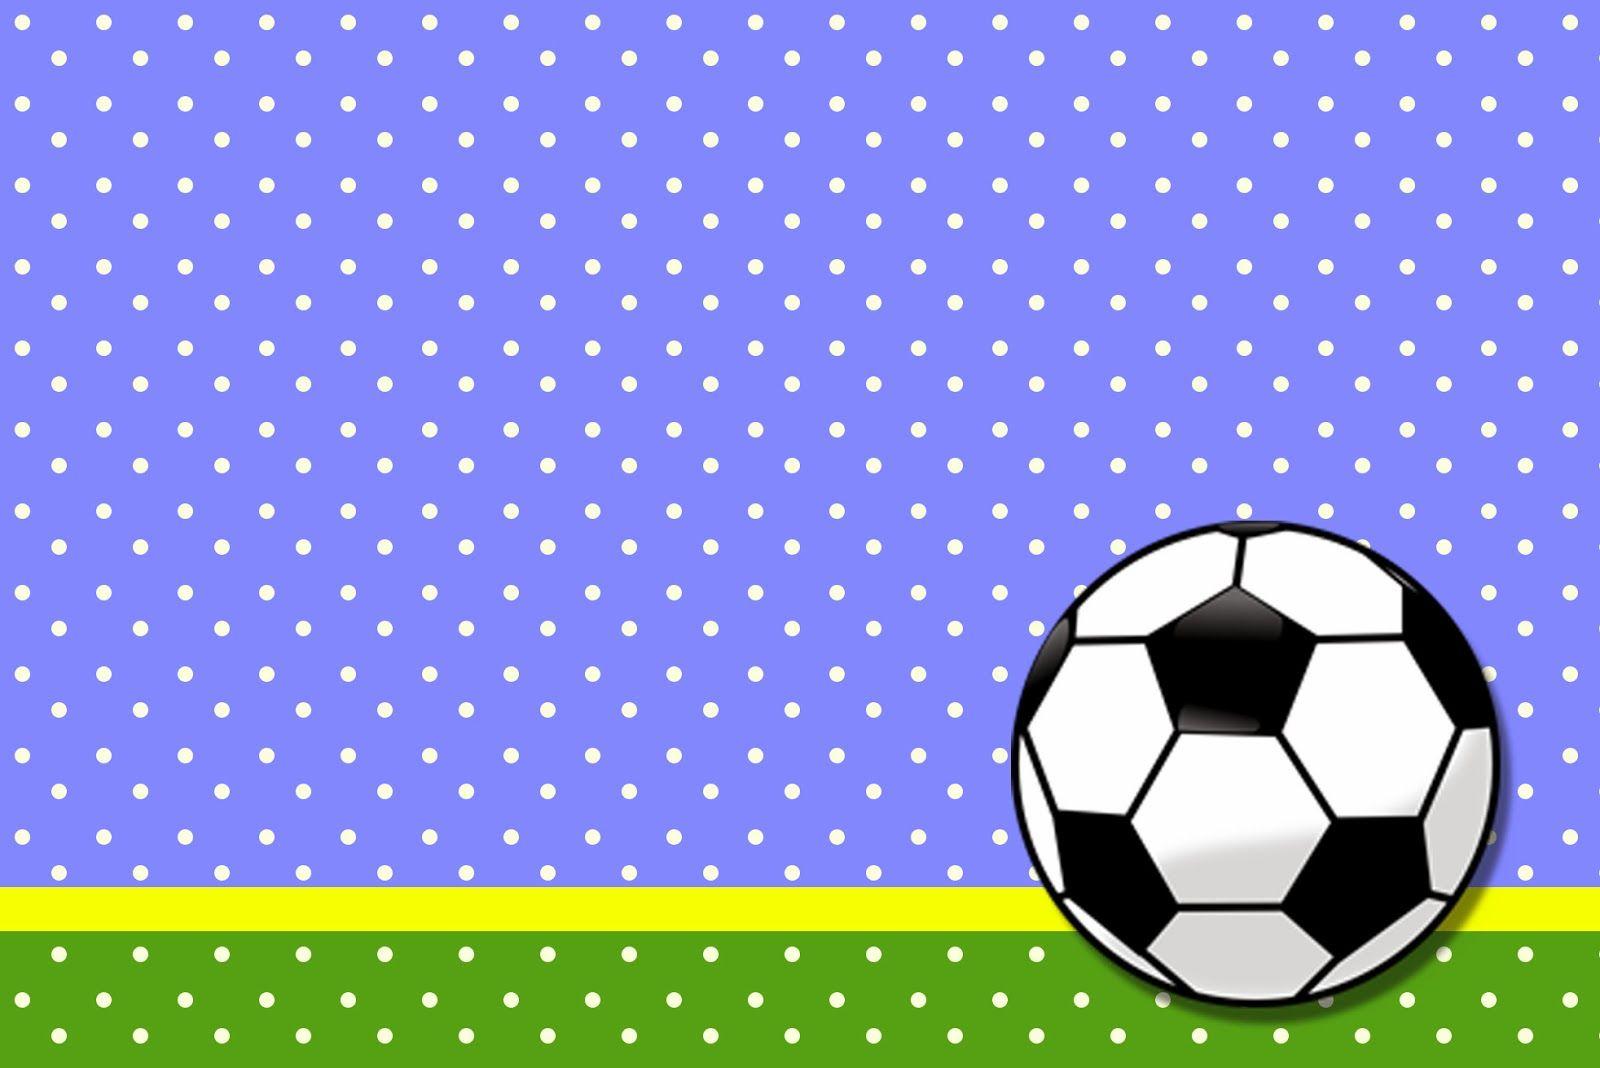 Fútbol Tarjetas O Invitaciones Para Imprimir Gratis American Girl Printables Soccer Ball Writing Paper